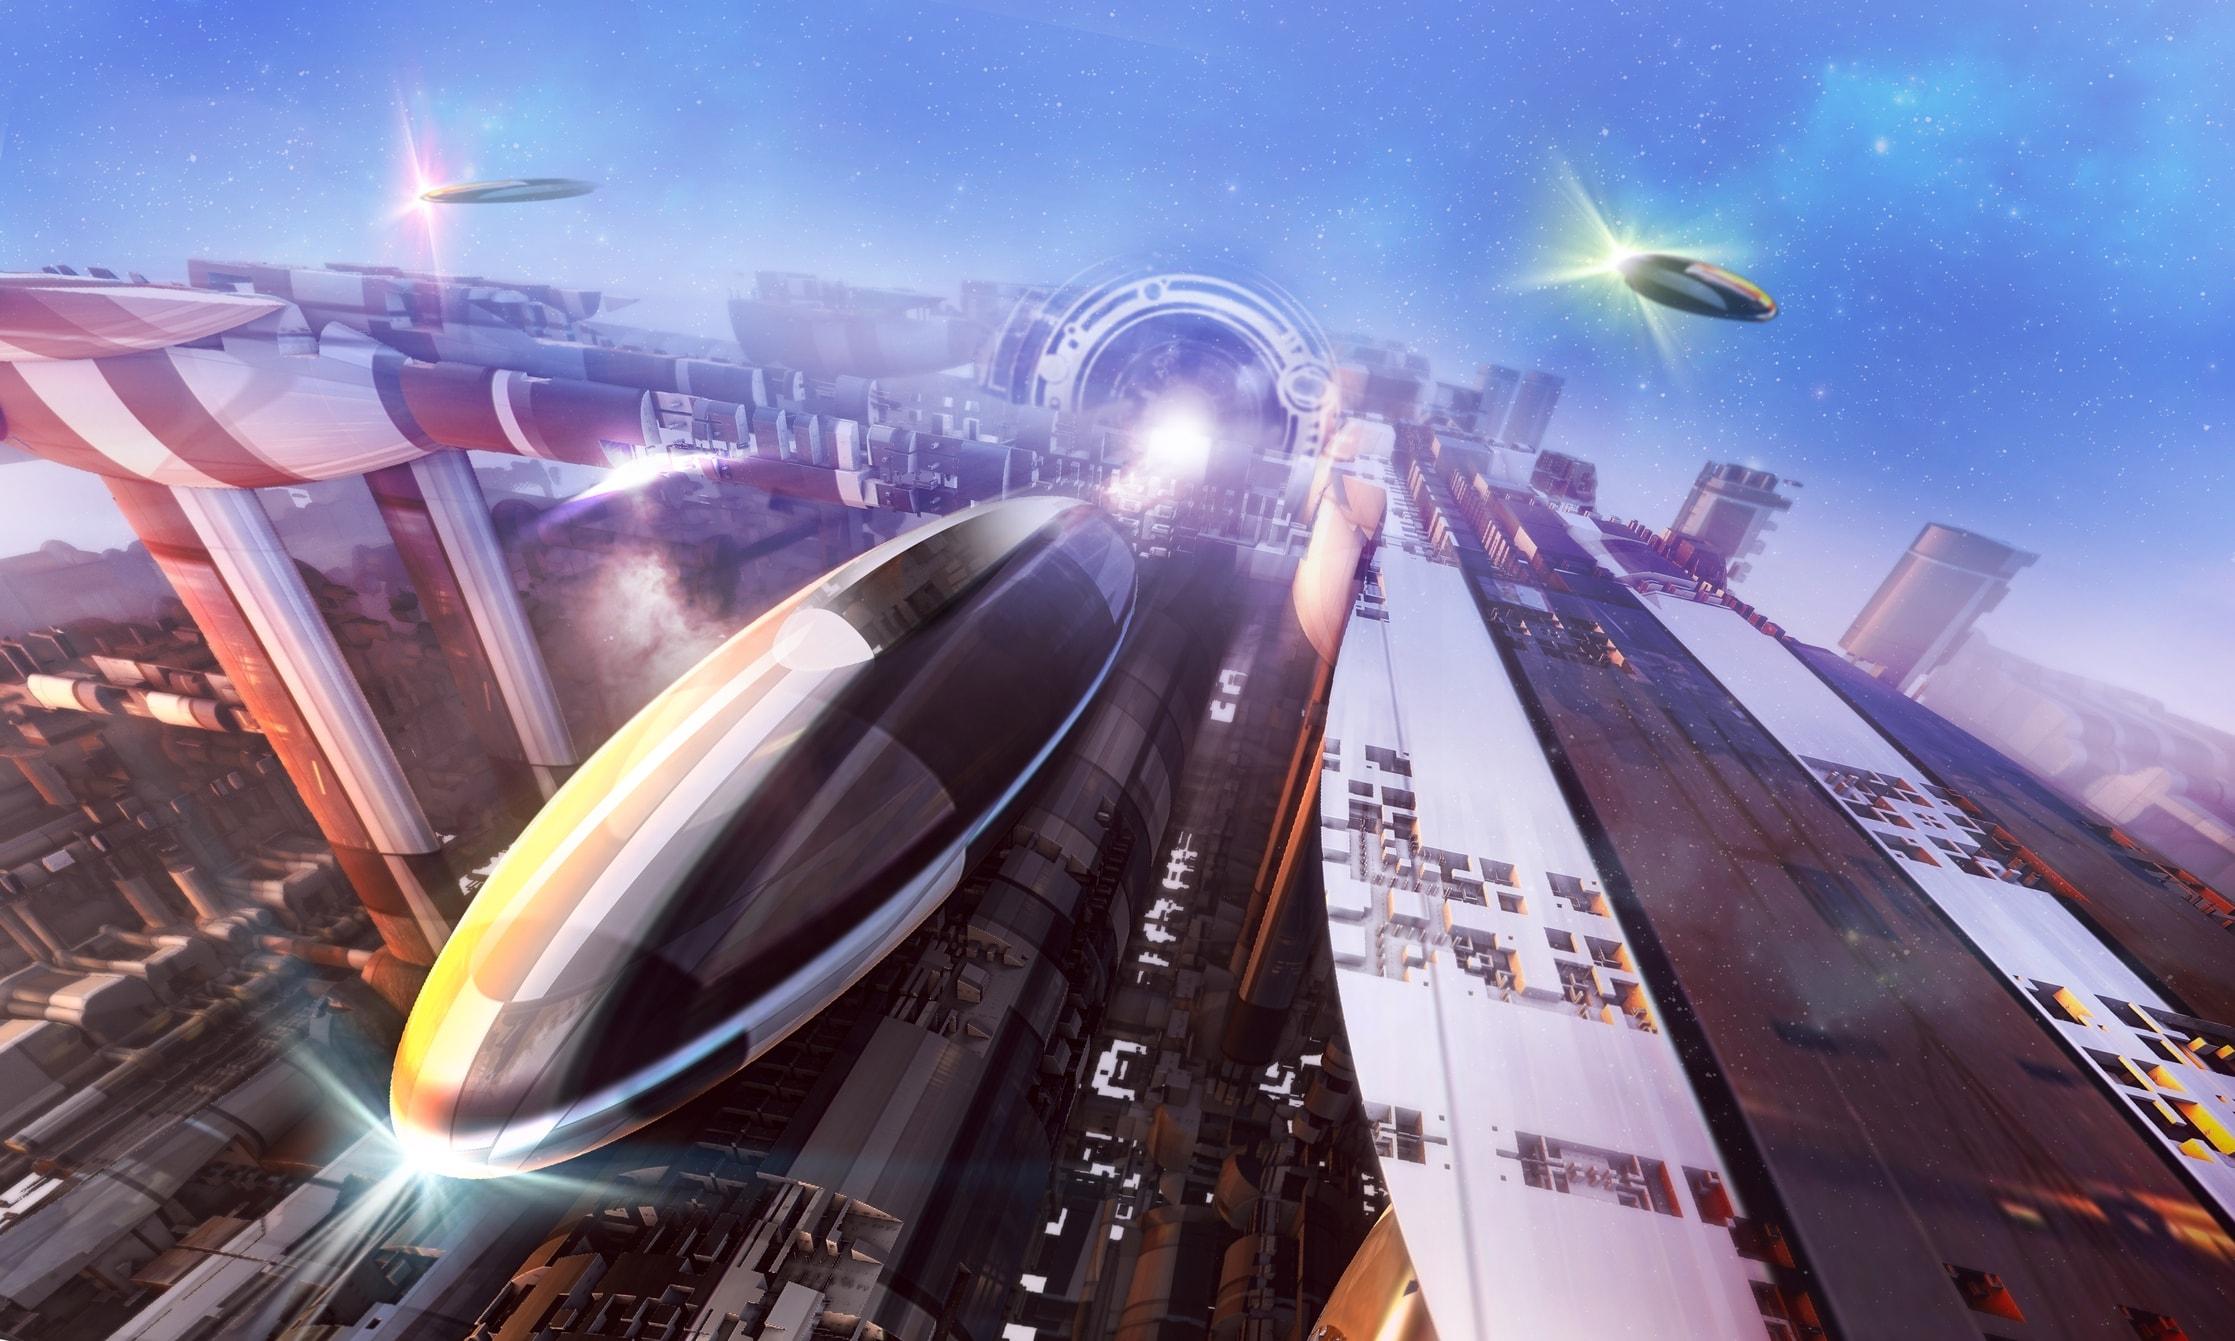 hyperloop hoverboard sea bubble zoom sur les transports du futur blog oney. Black Bedroom Furniture Sets. Home Design Ideas